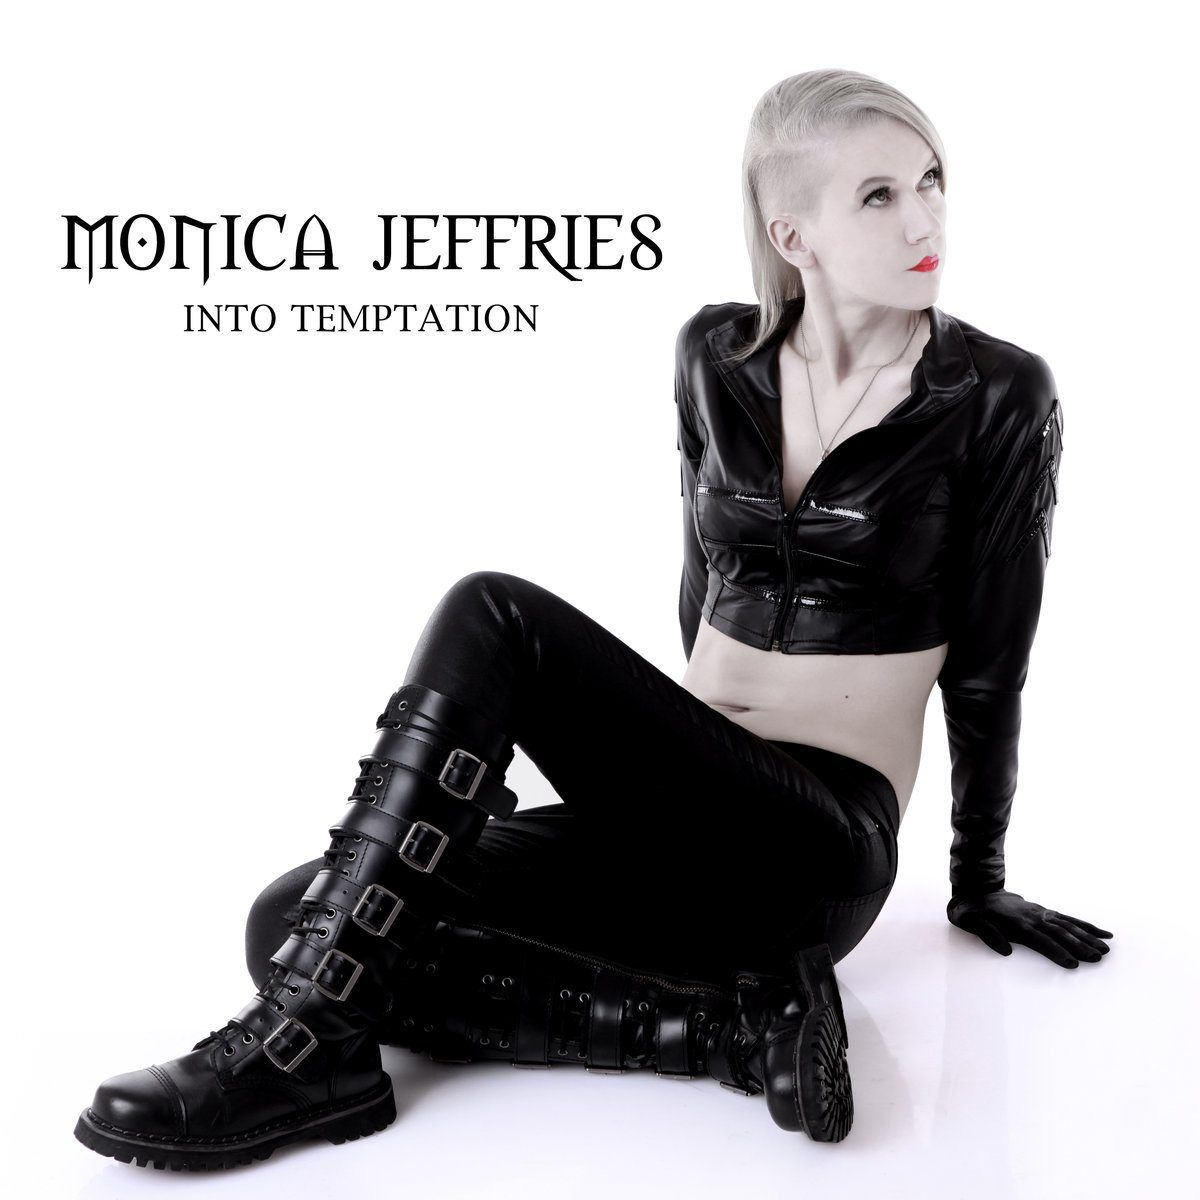 Monica Jeffries – Into Temptation